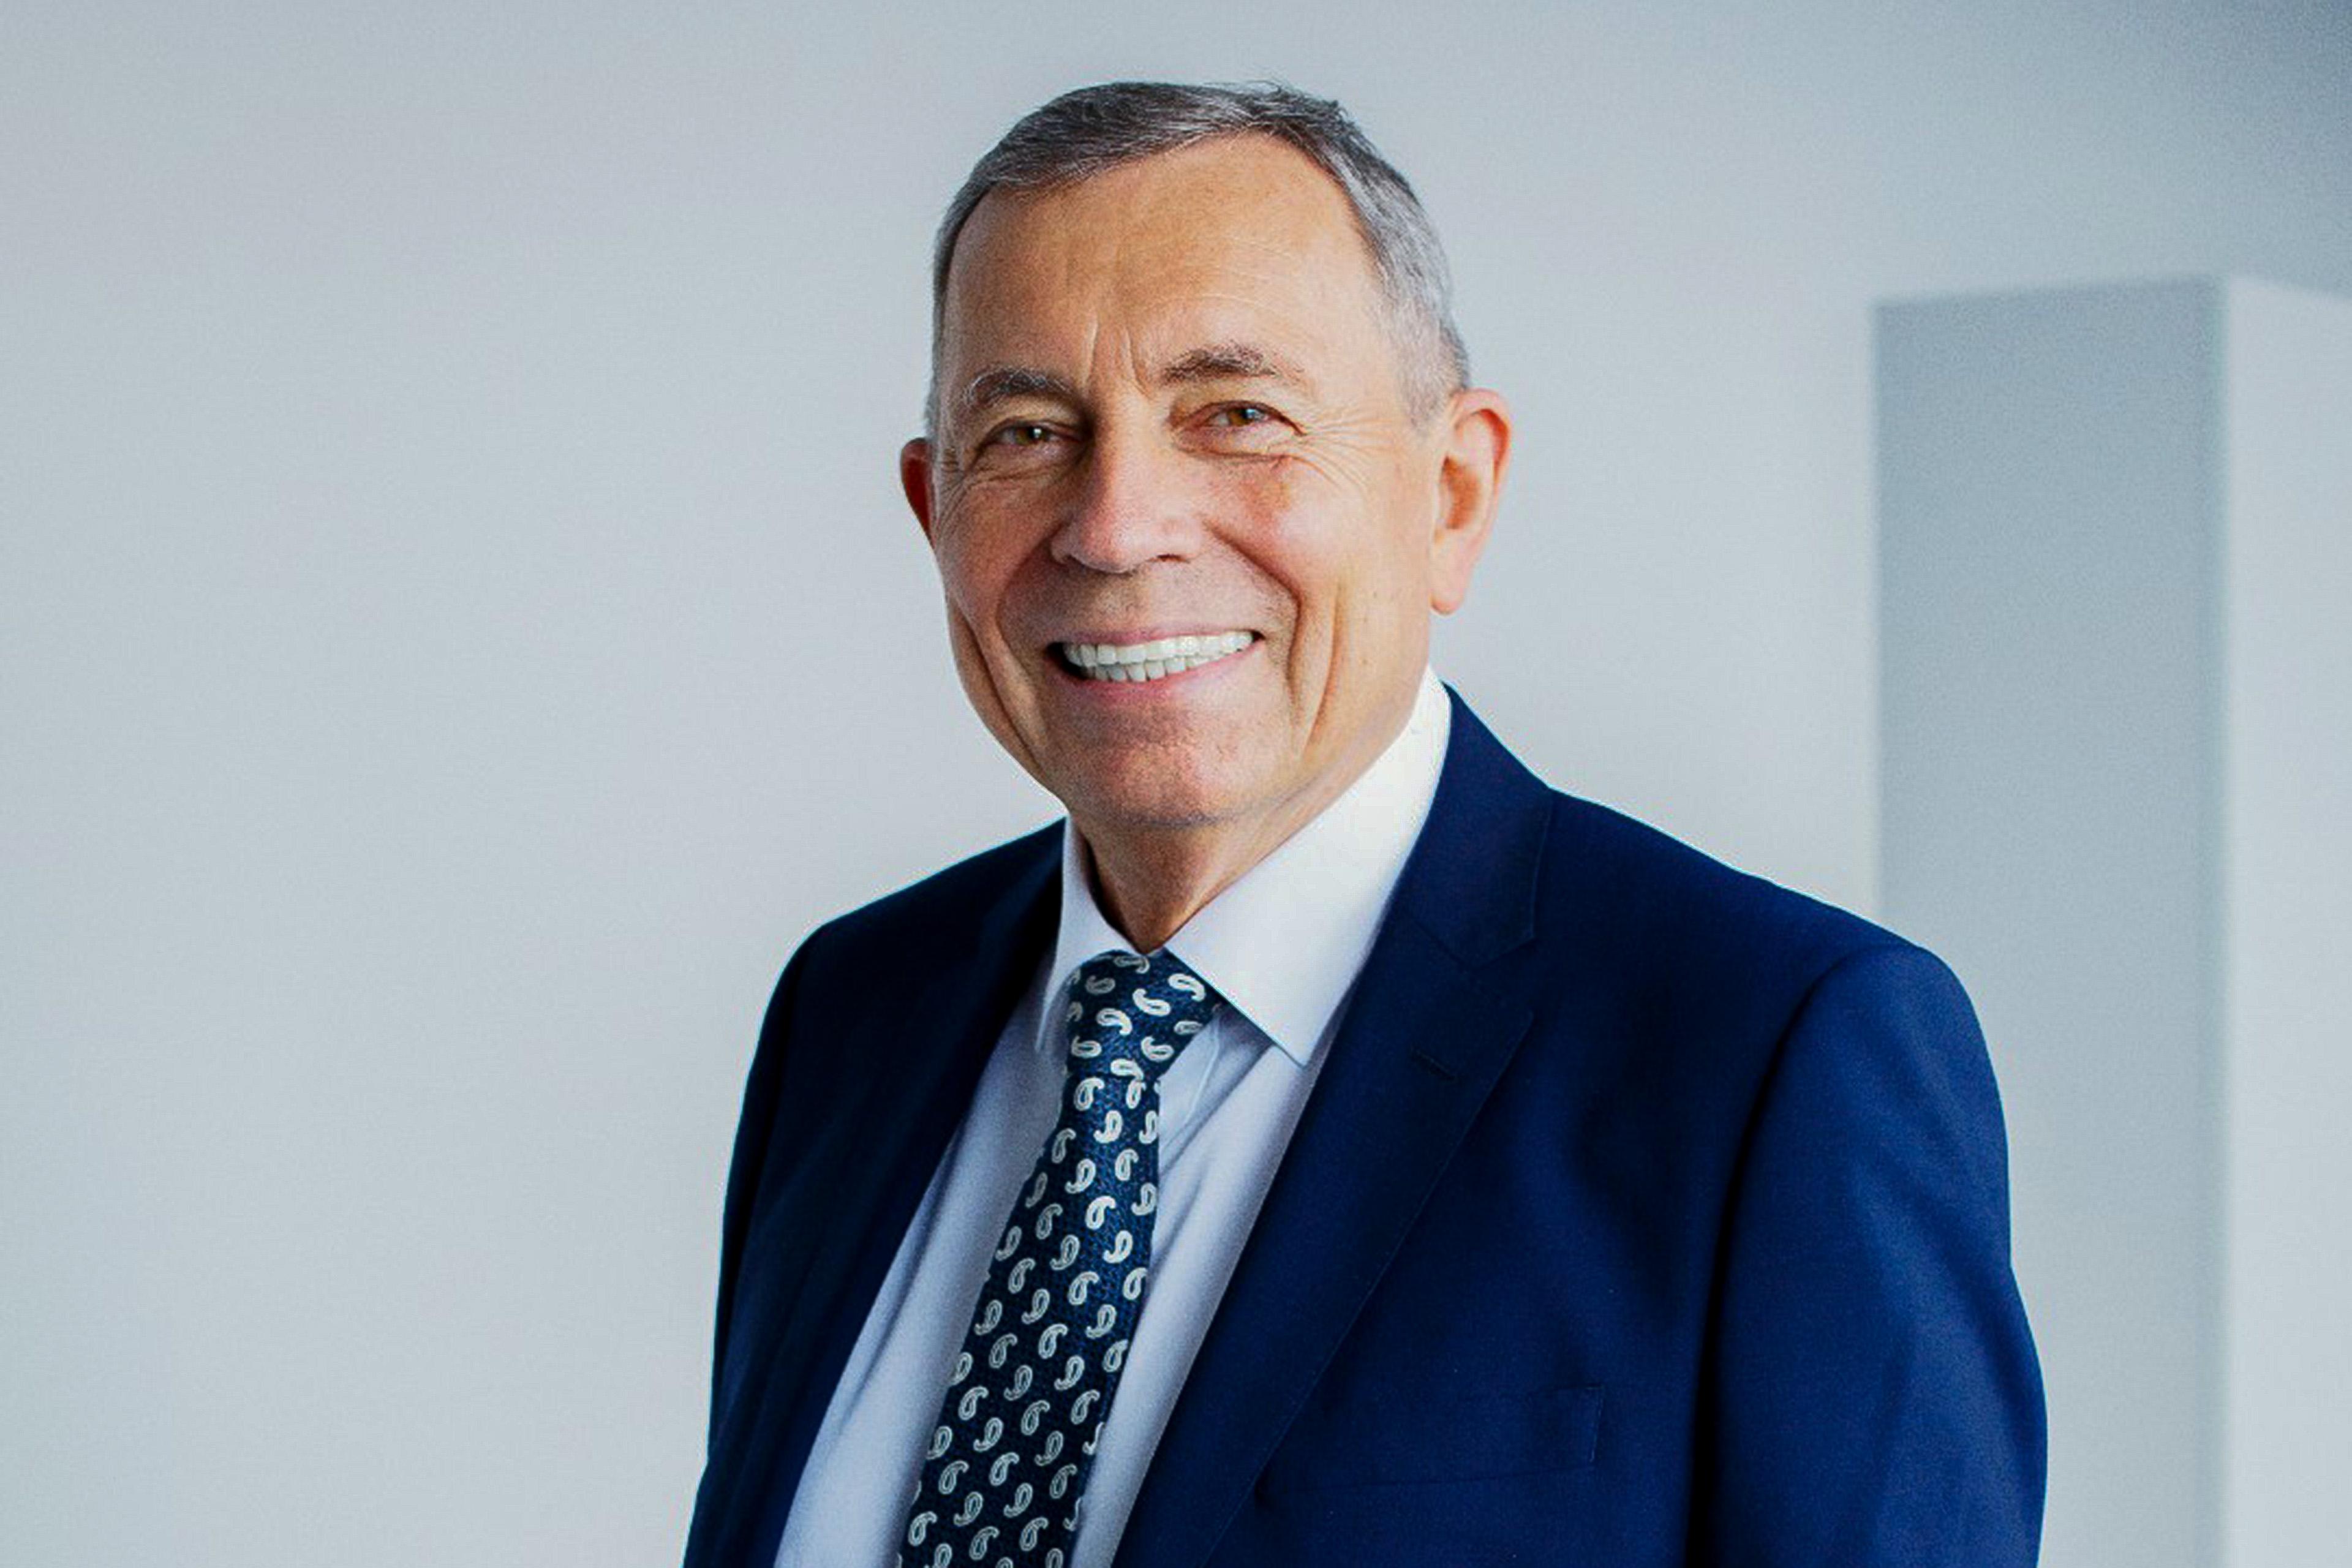 2019 Entrepreneur Vladimir Linev